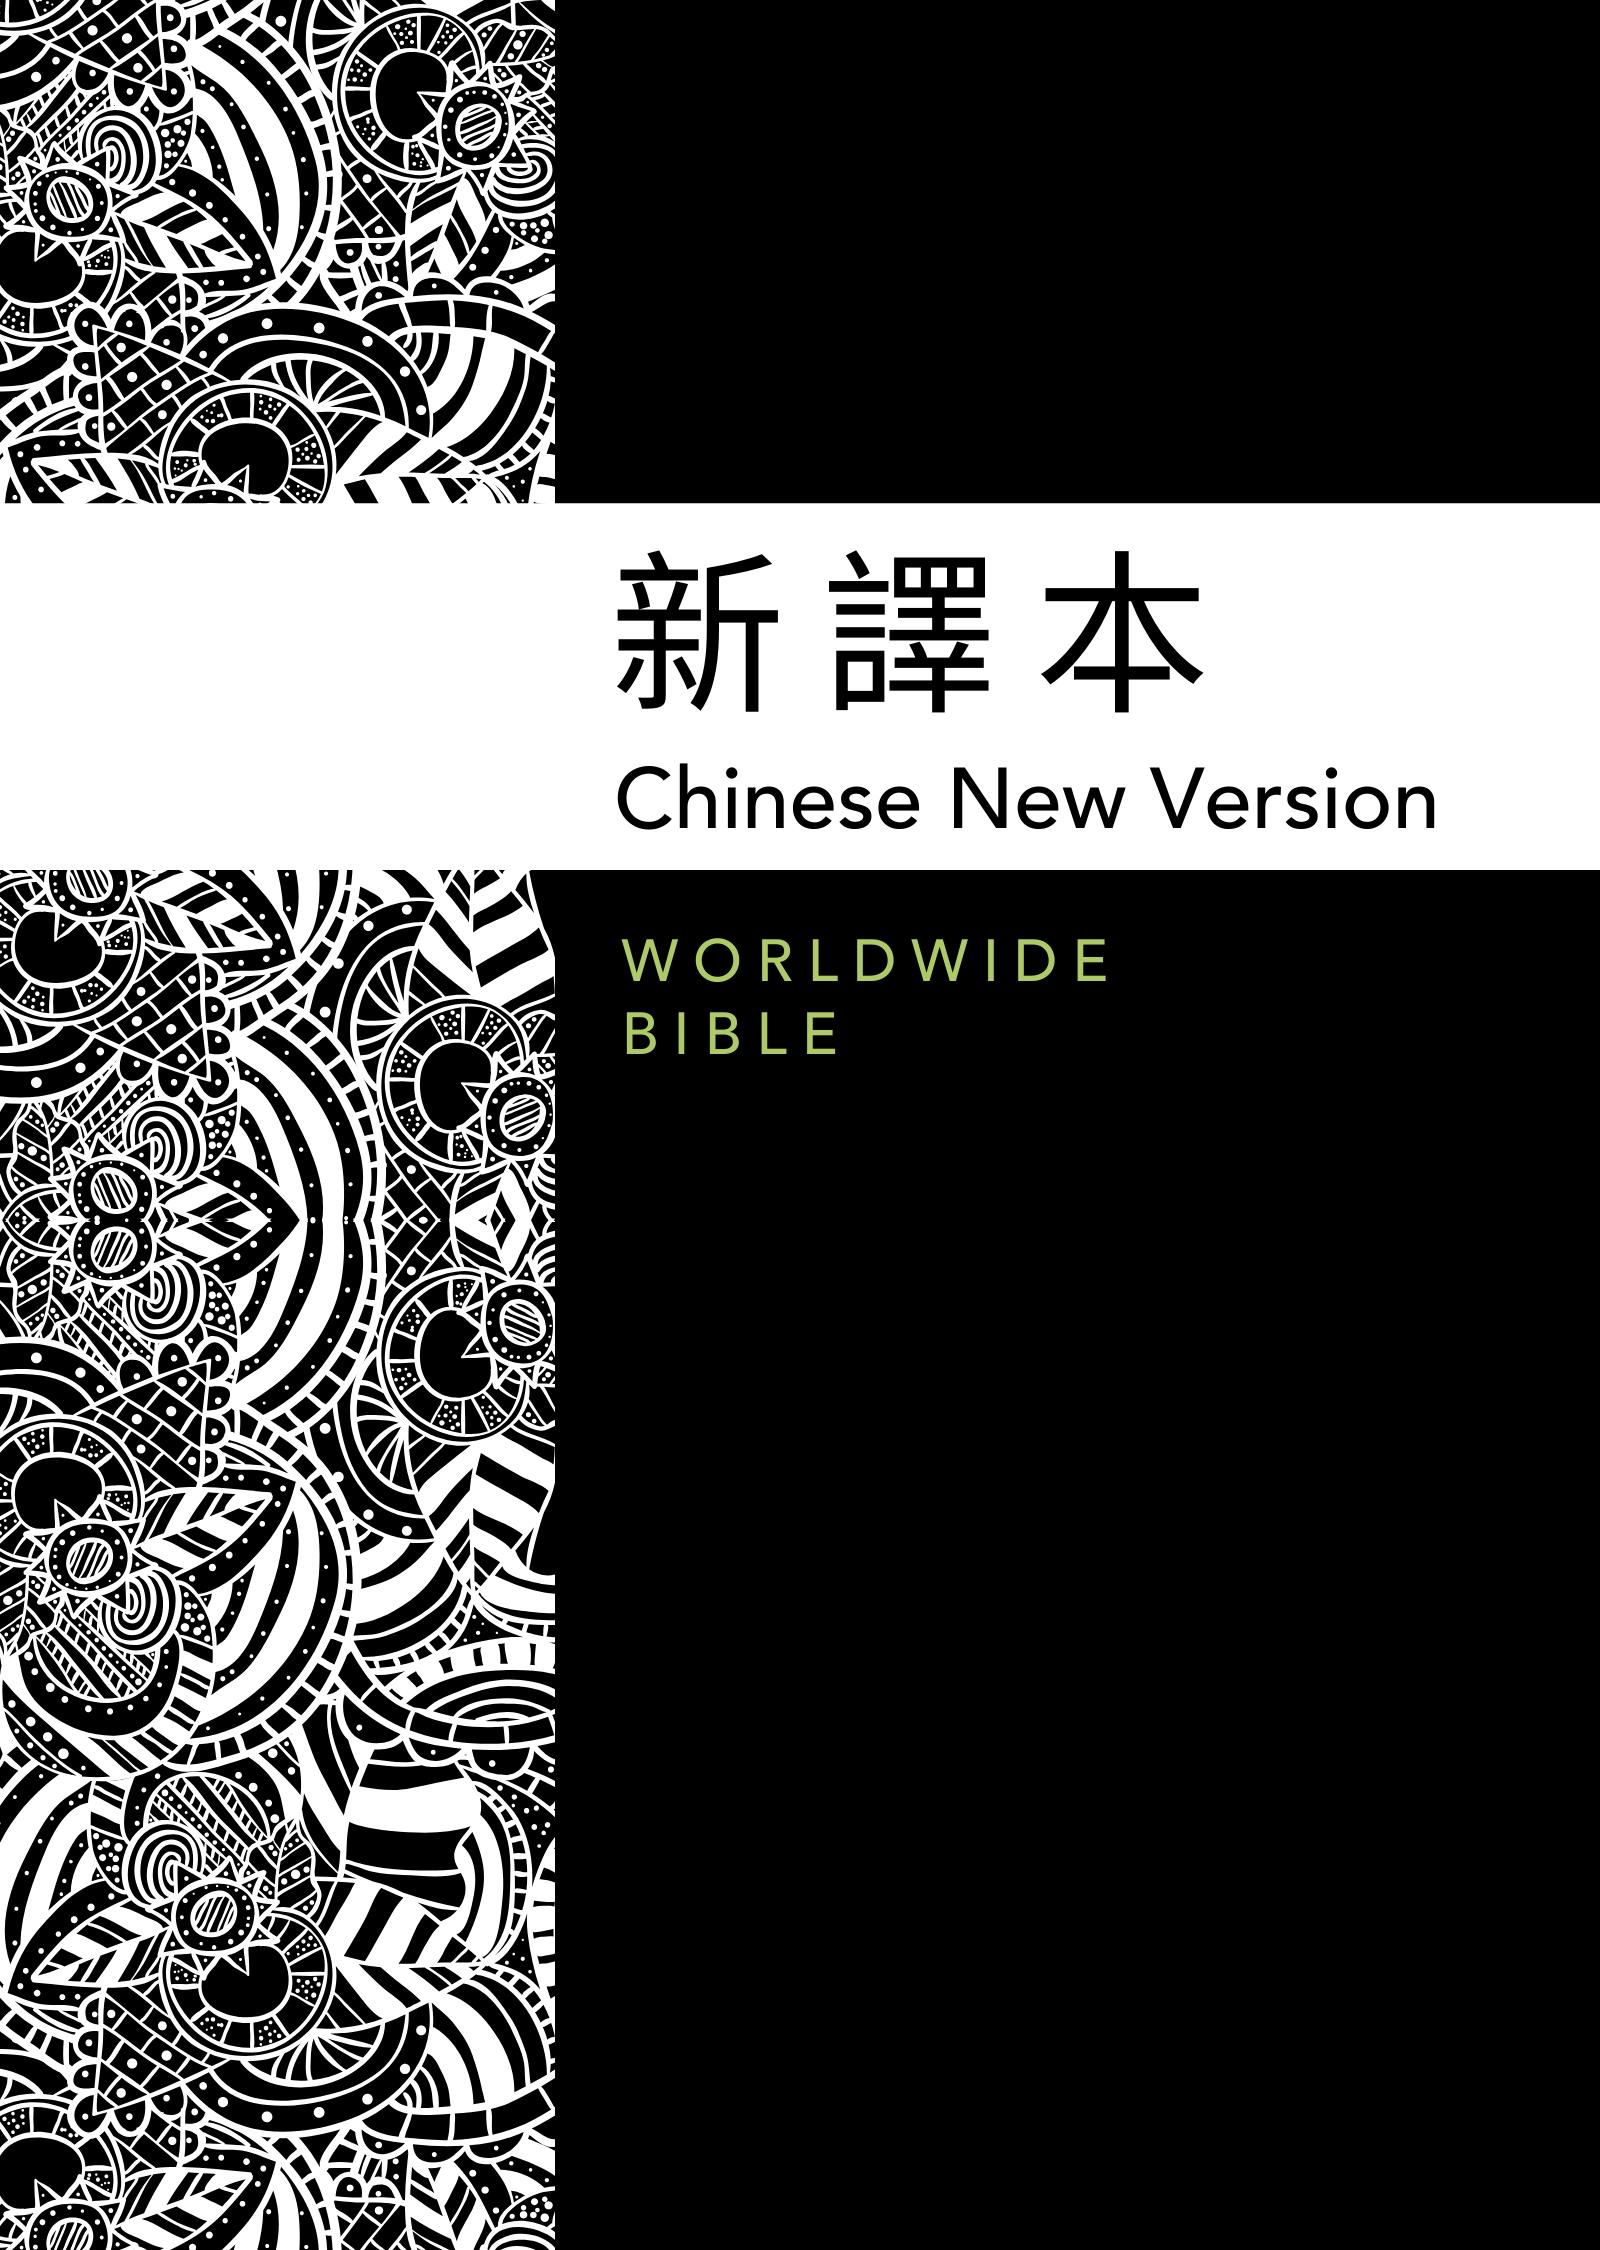 Chinese New Version (CNV 新譯本)